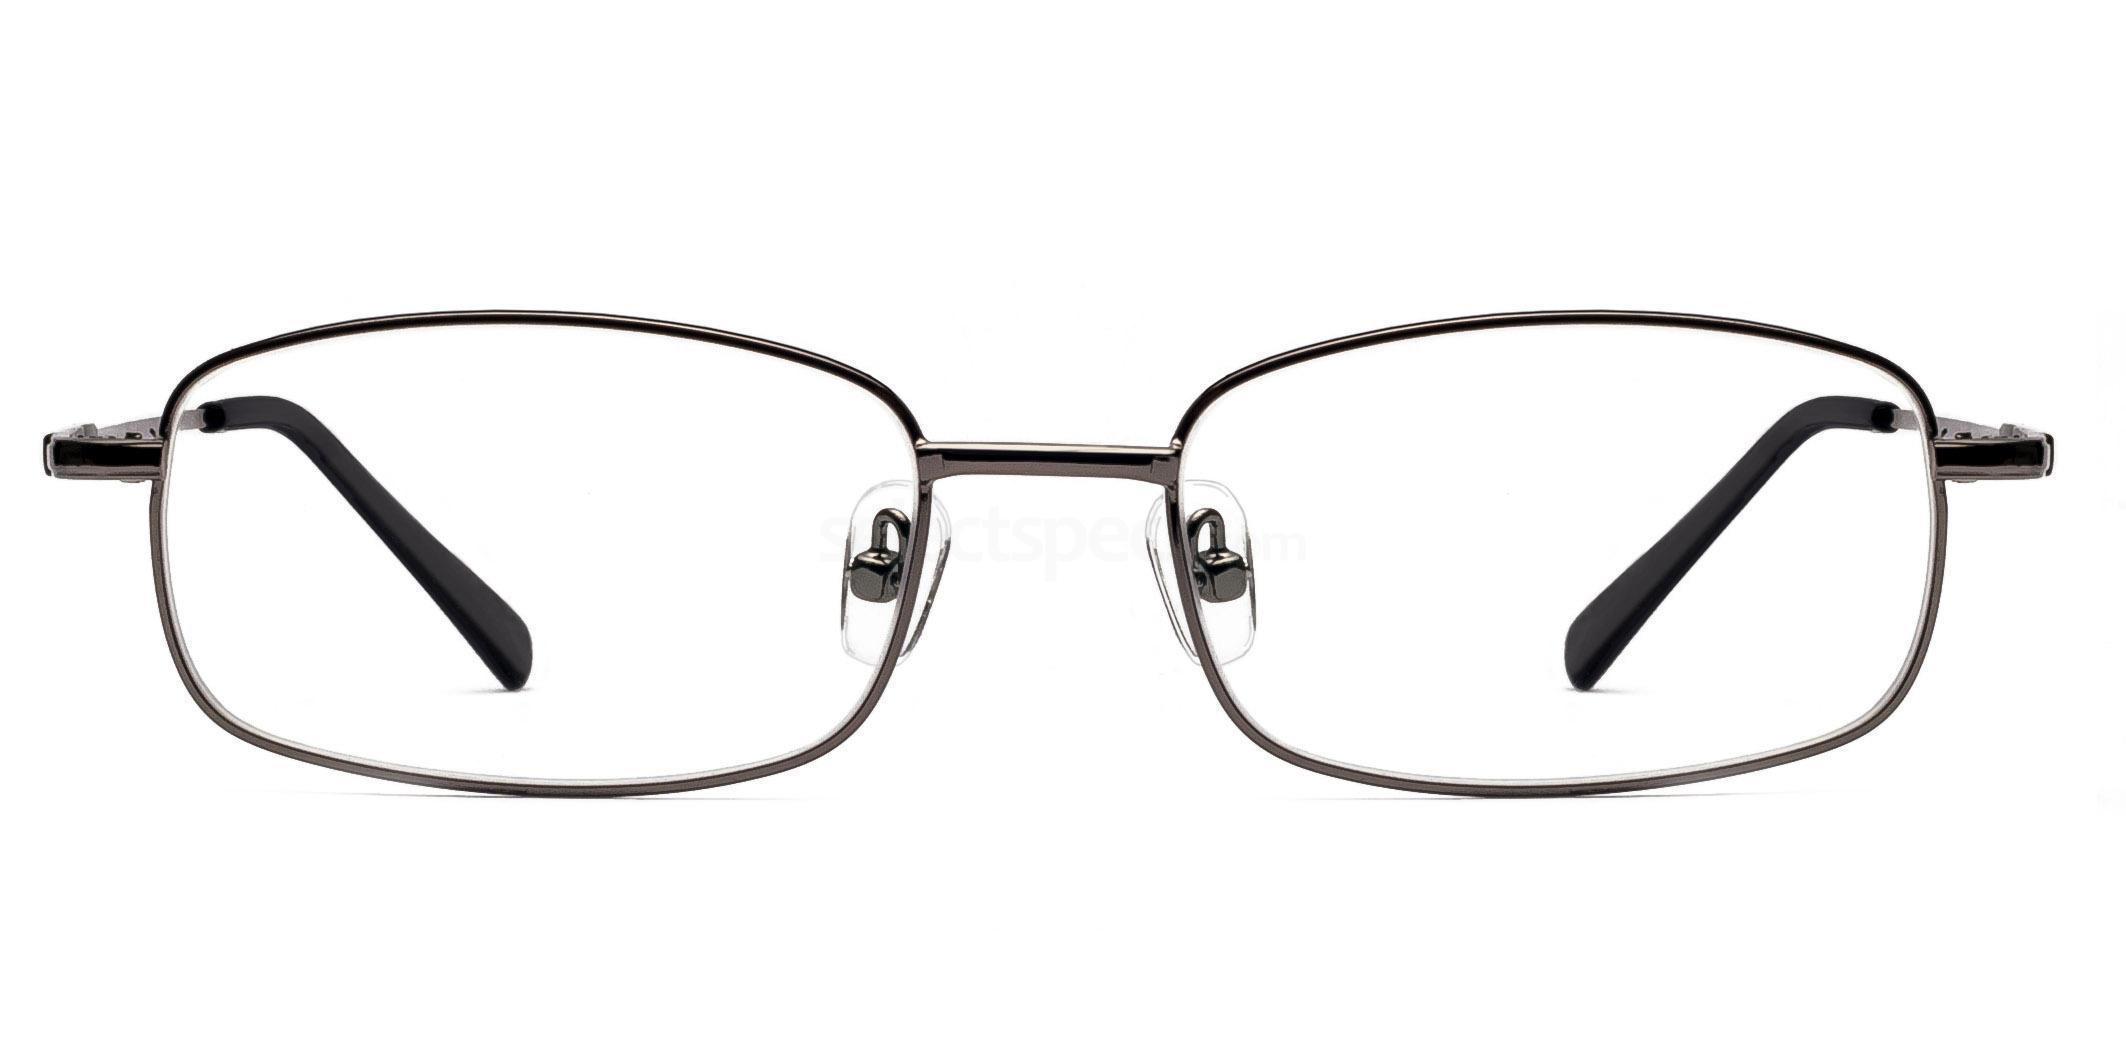 b71153fc4d2d savannah 8052 gunmetal glasses free lenses   delivery omnioptics australia.  SELECTSPECS